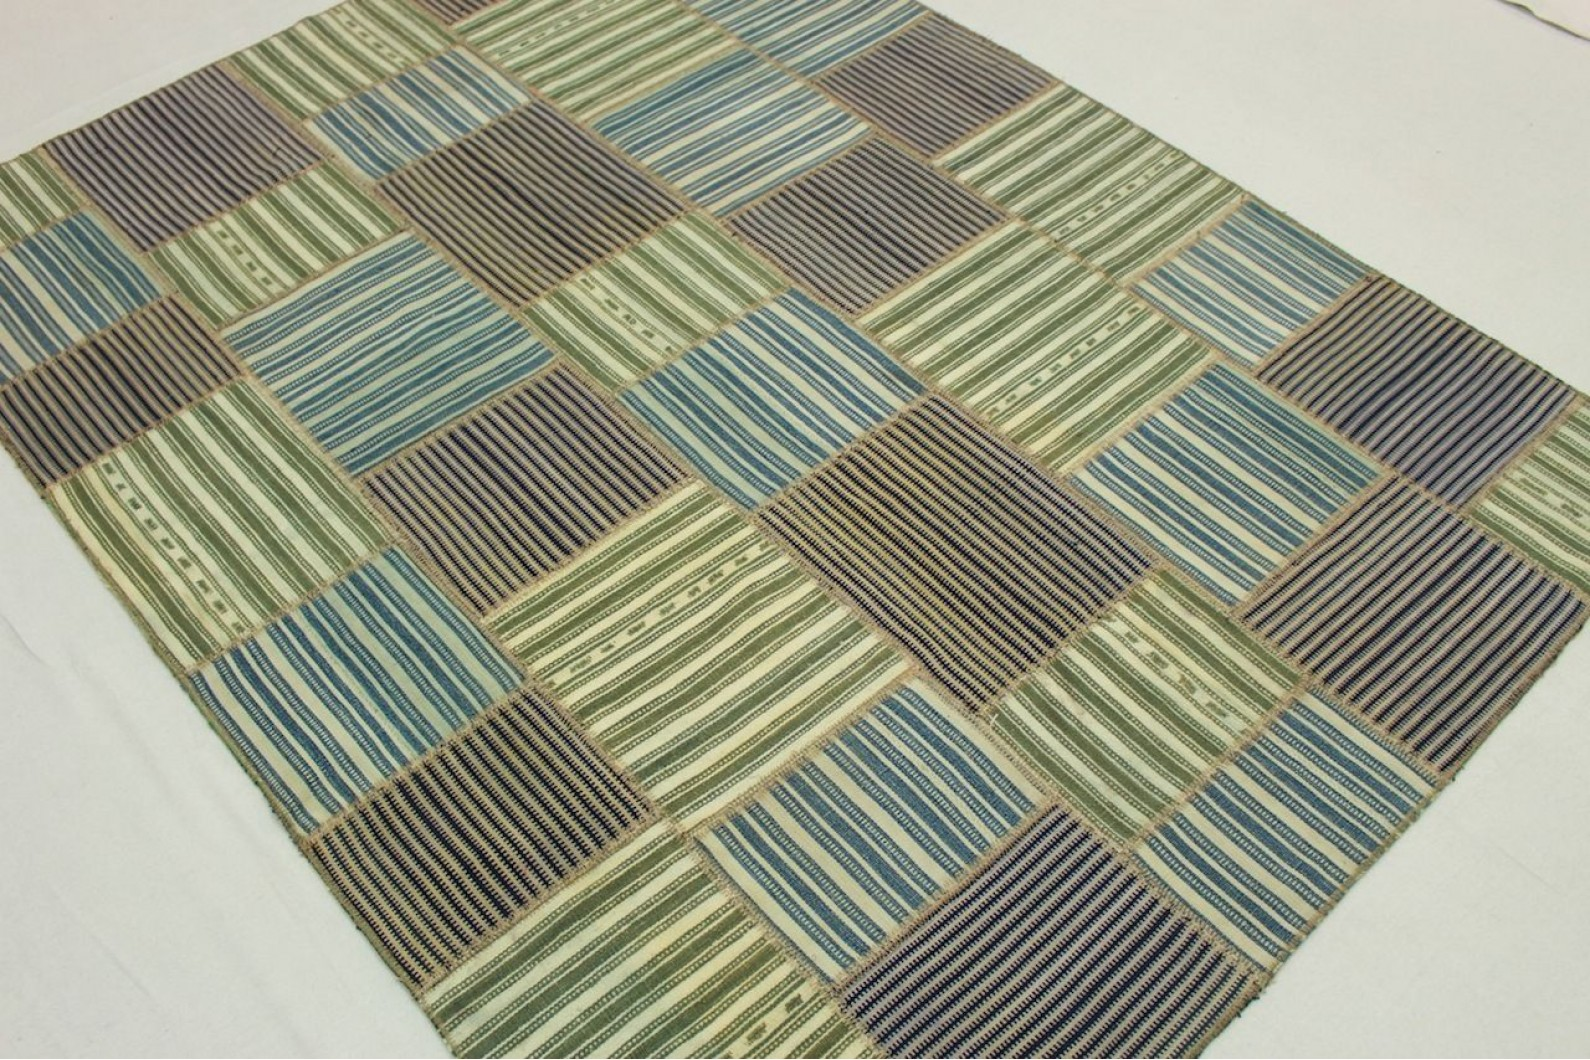 kelim patchwork teppich gr n blau beige in 200x150cm 1001. Black Bedroom Furniture Sets. Home Design Ideas